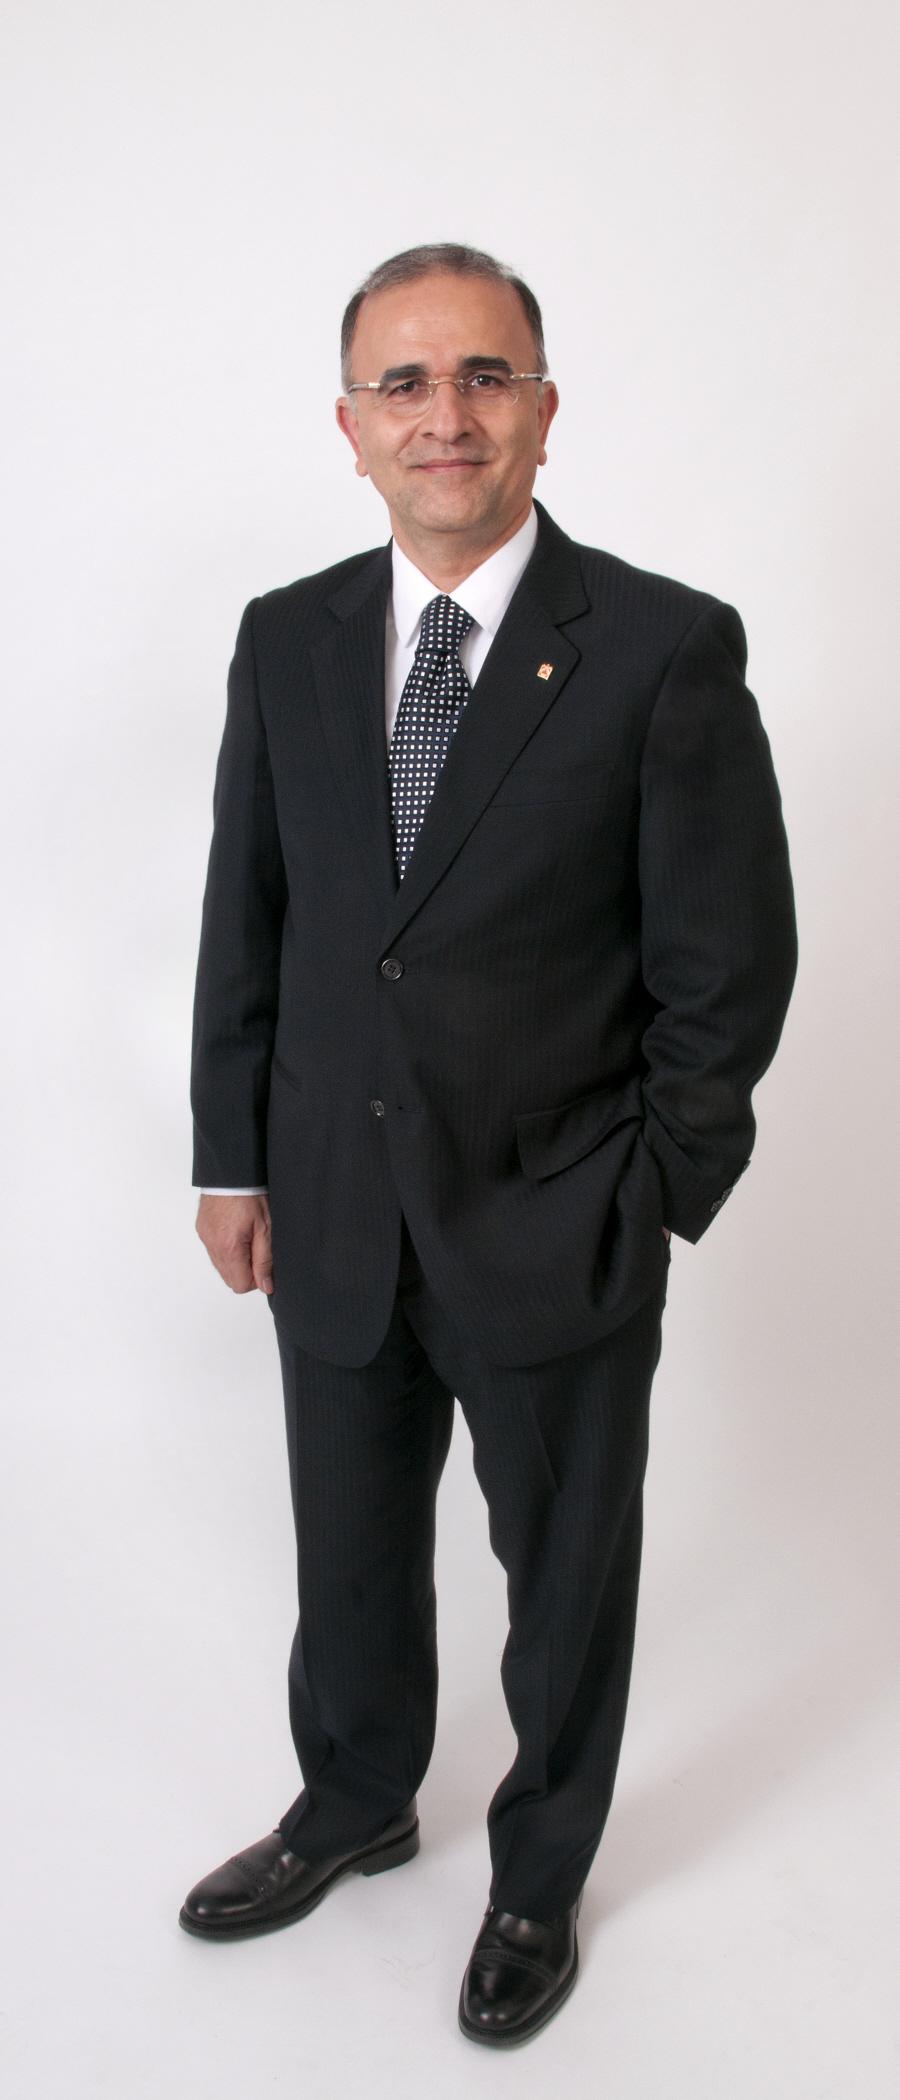 Hazem Barakat, PhD